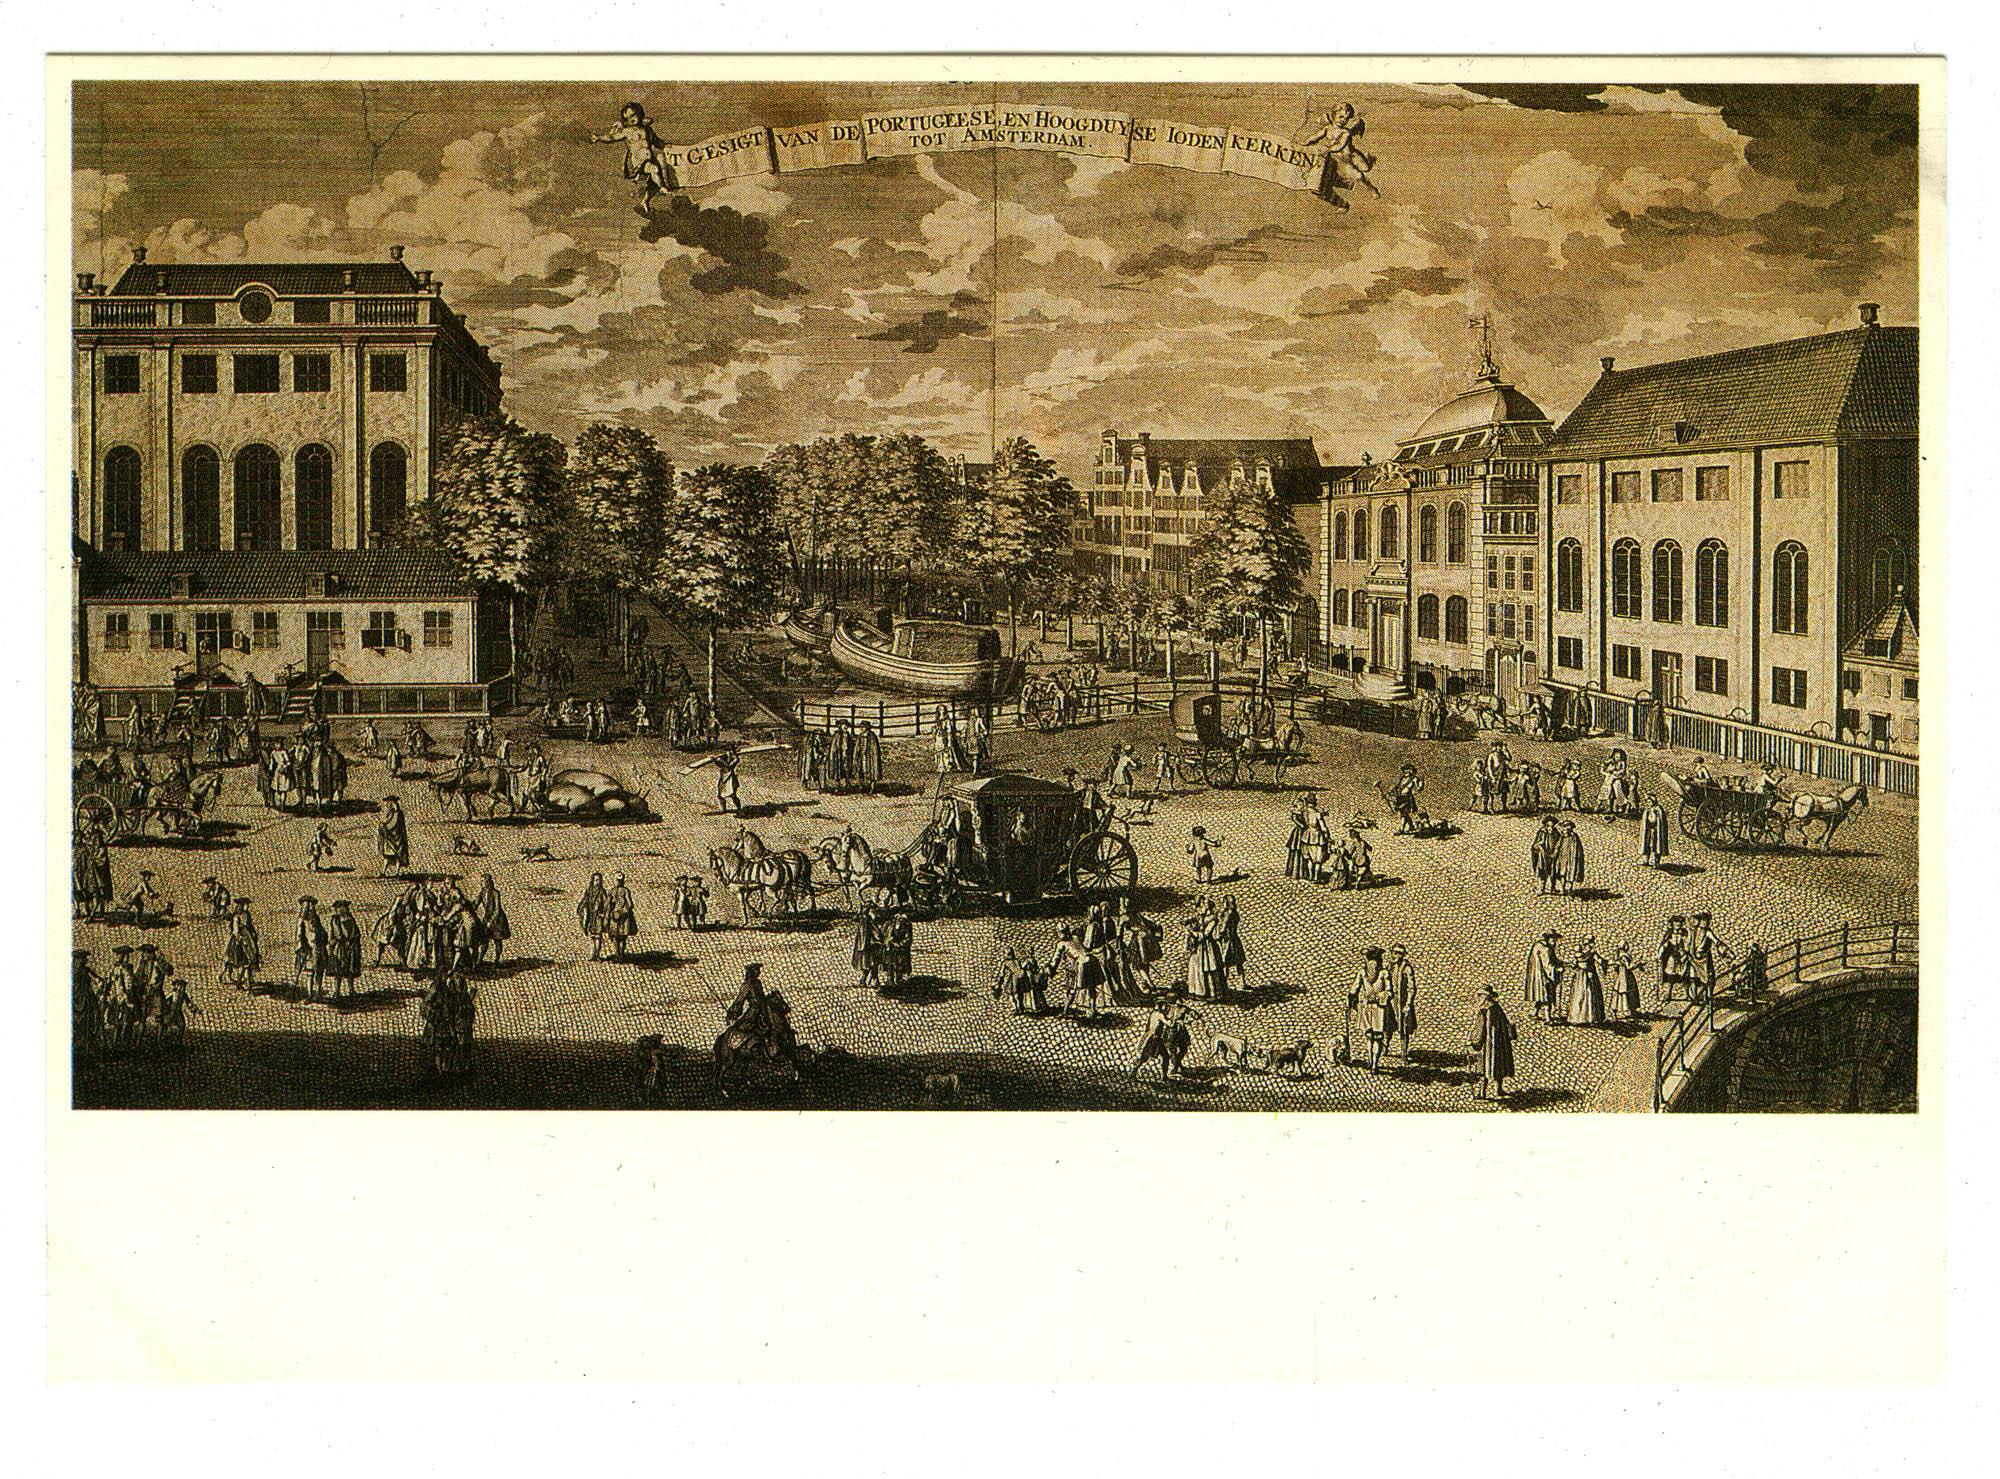 Adolf van der Laan (1684-na/after 1755). De Portugese en Hoogduitse synagogen, gravure / The Portuguese and Ashkenazic synagogues, engraving, 1710-1752